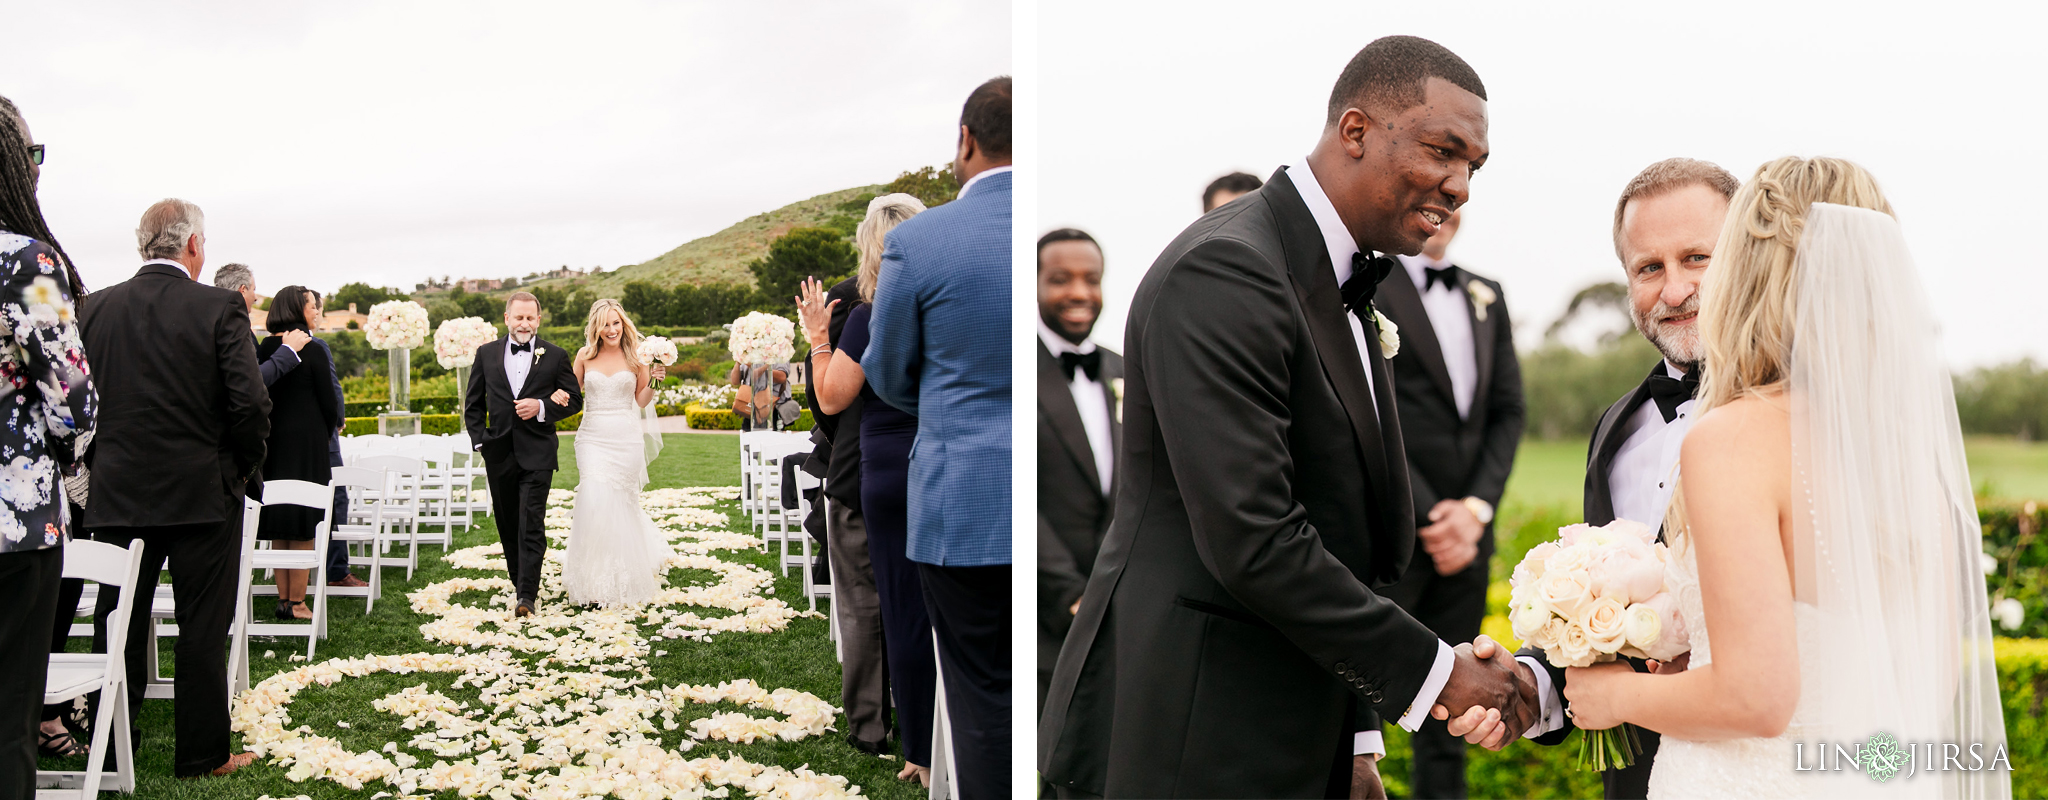 13 Pelican Hill Resort Orange County Wedding Photographer